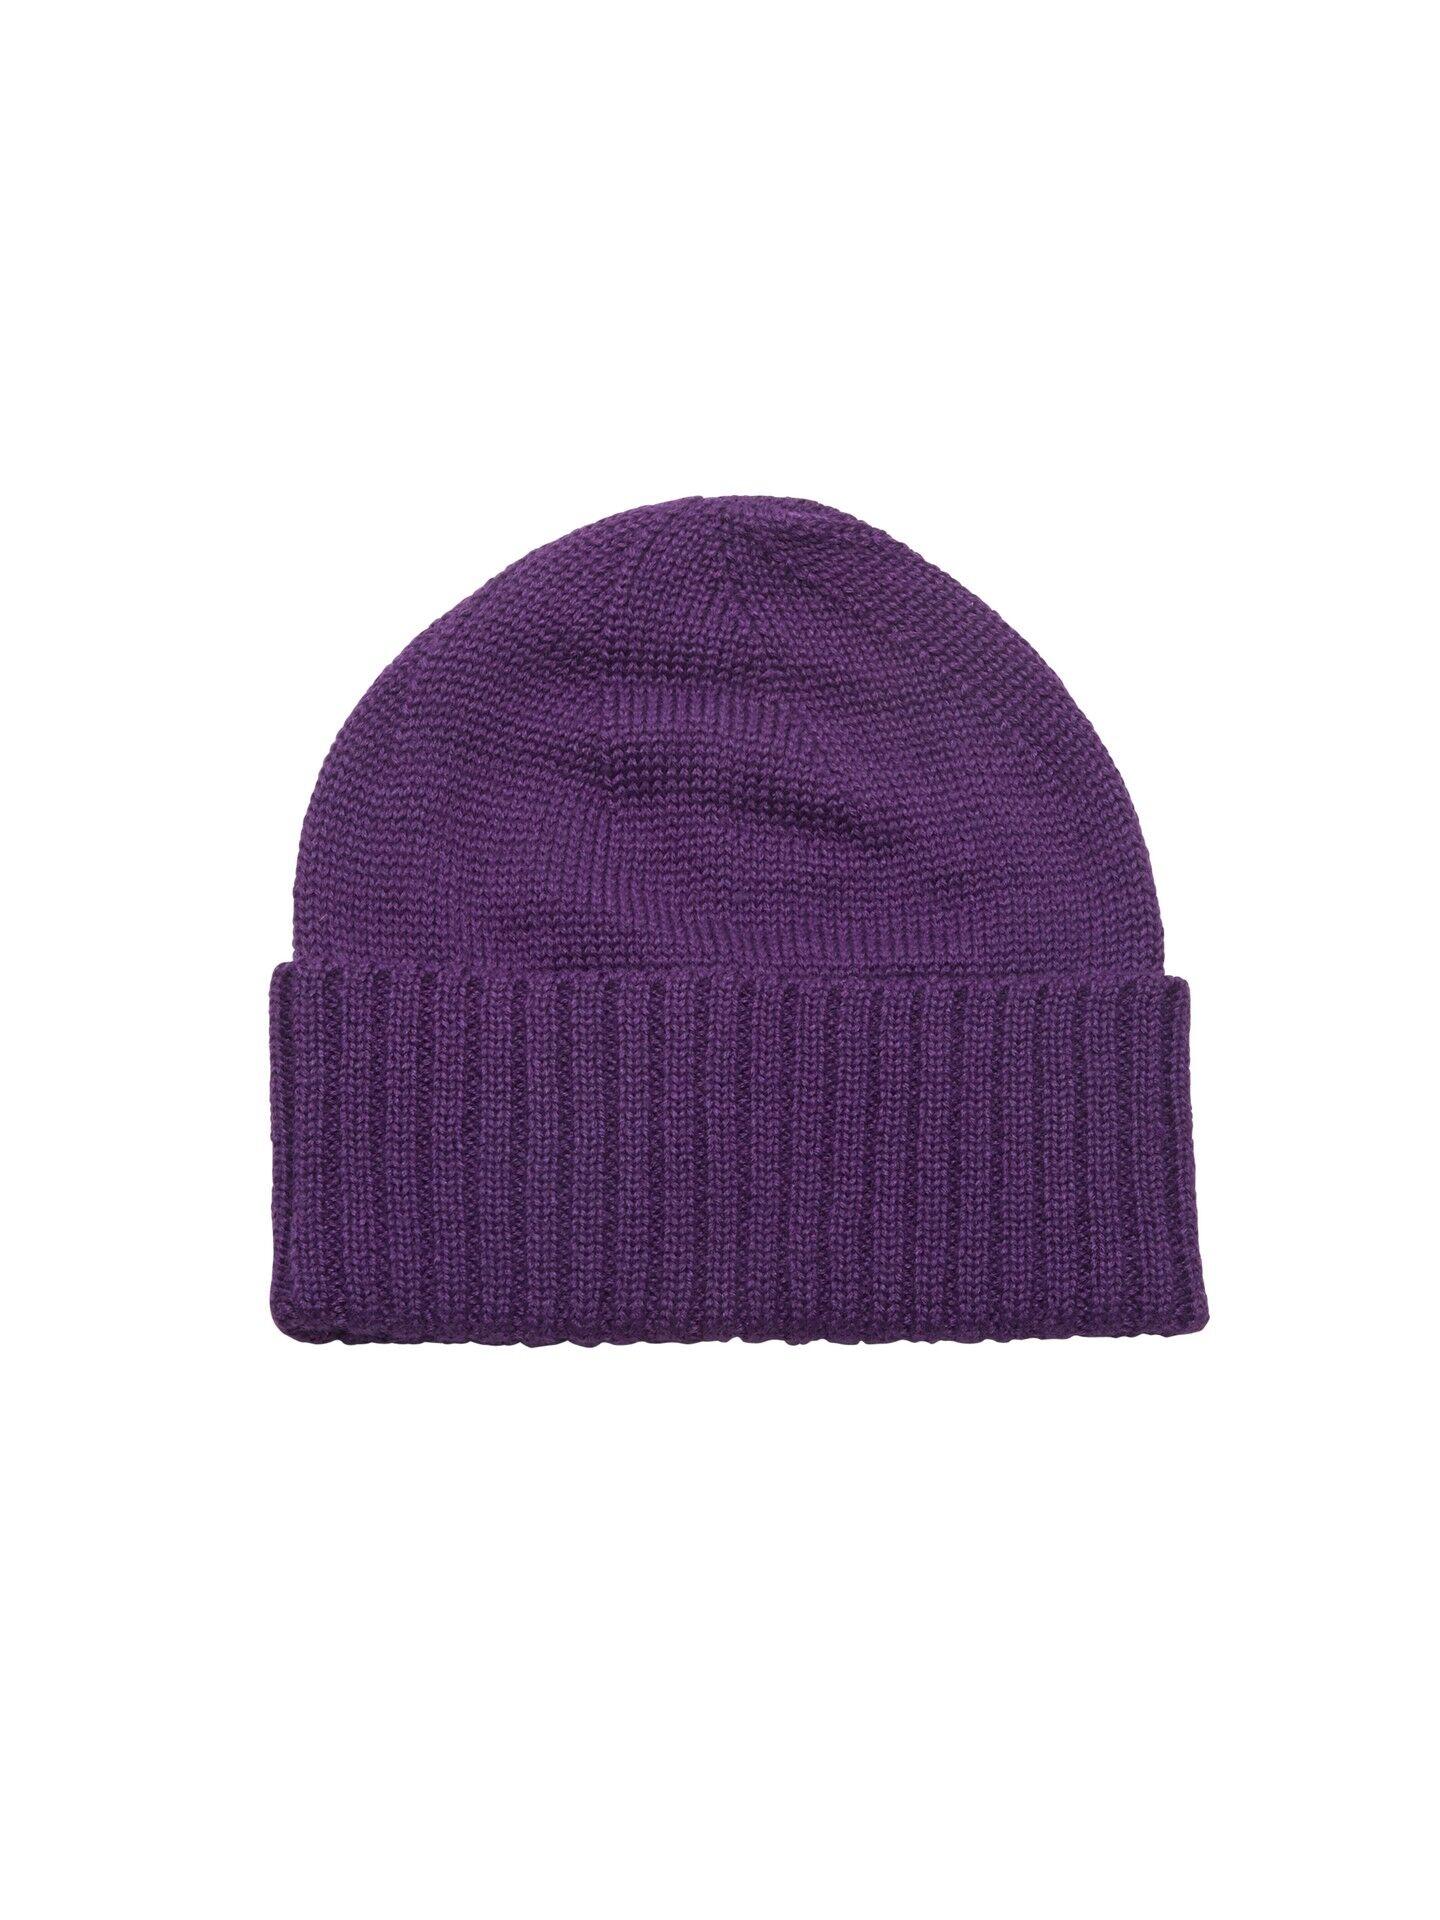 Alternative Apparel Londoner Beanie - Purple - Size: OS